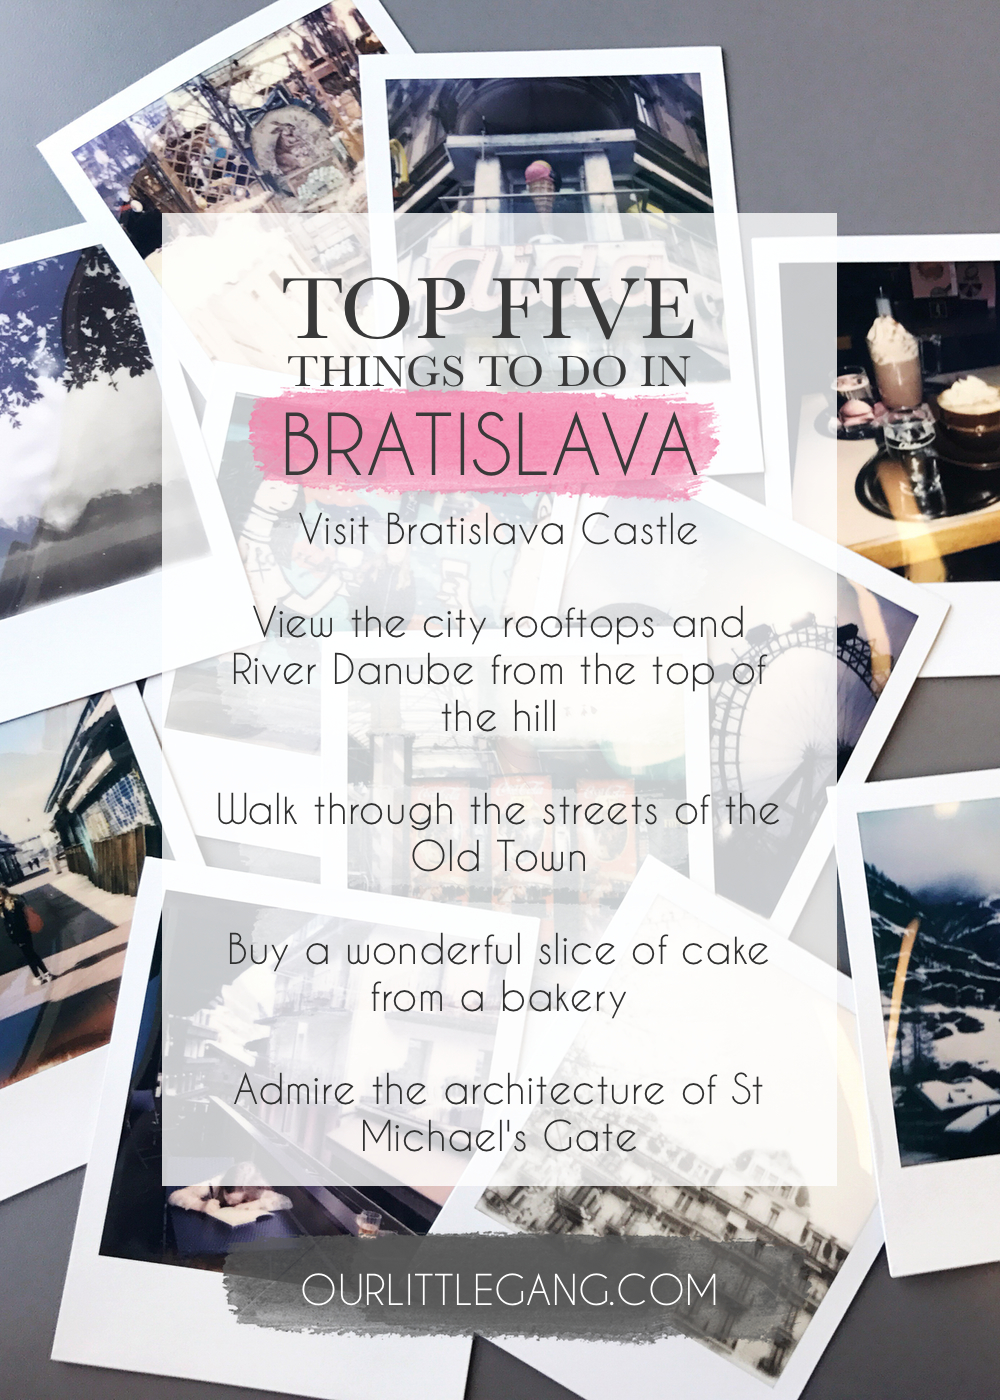 top-five-things-to-do-in-bratislava-slovakia.jpg